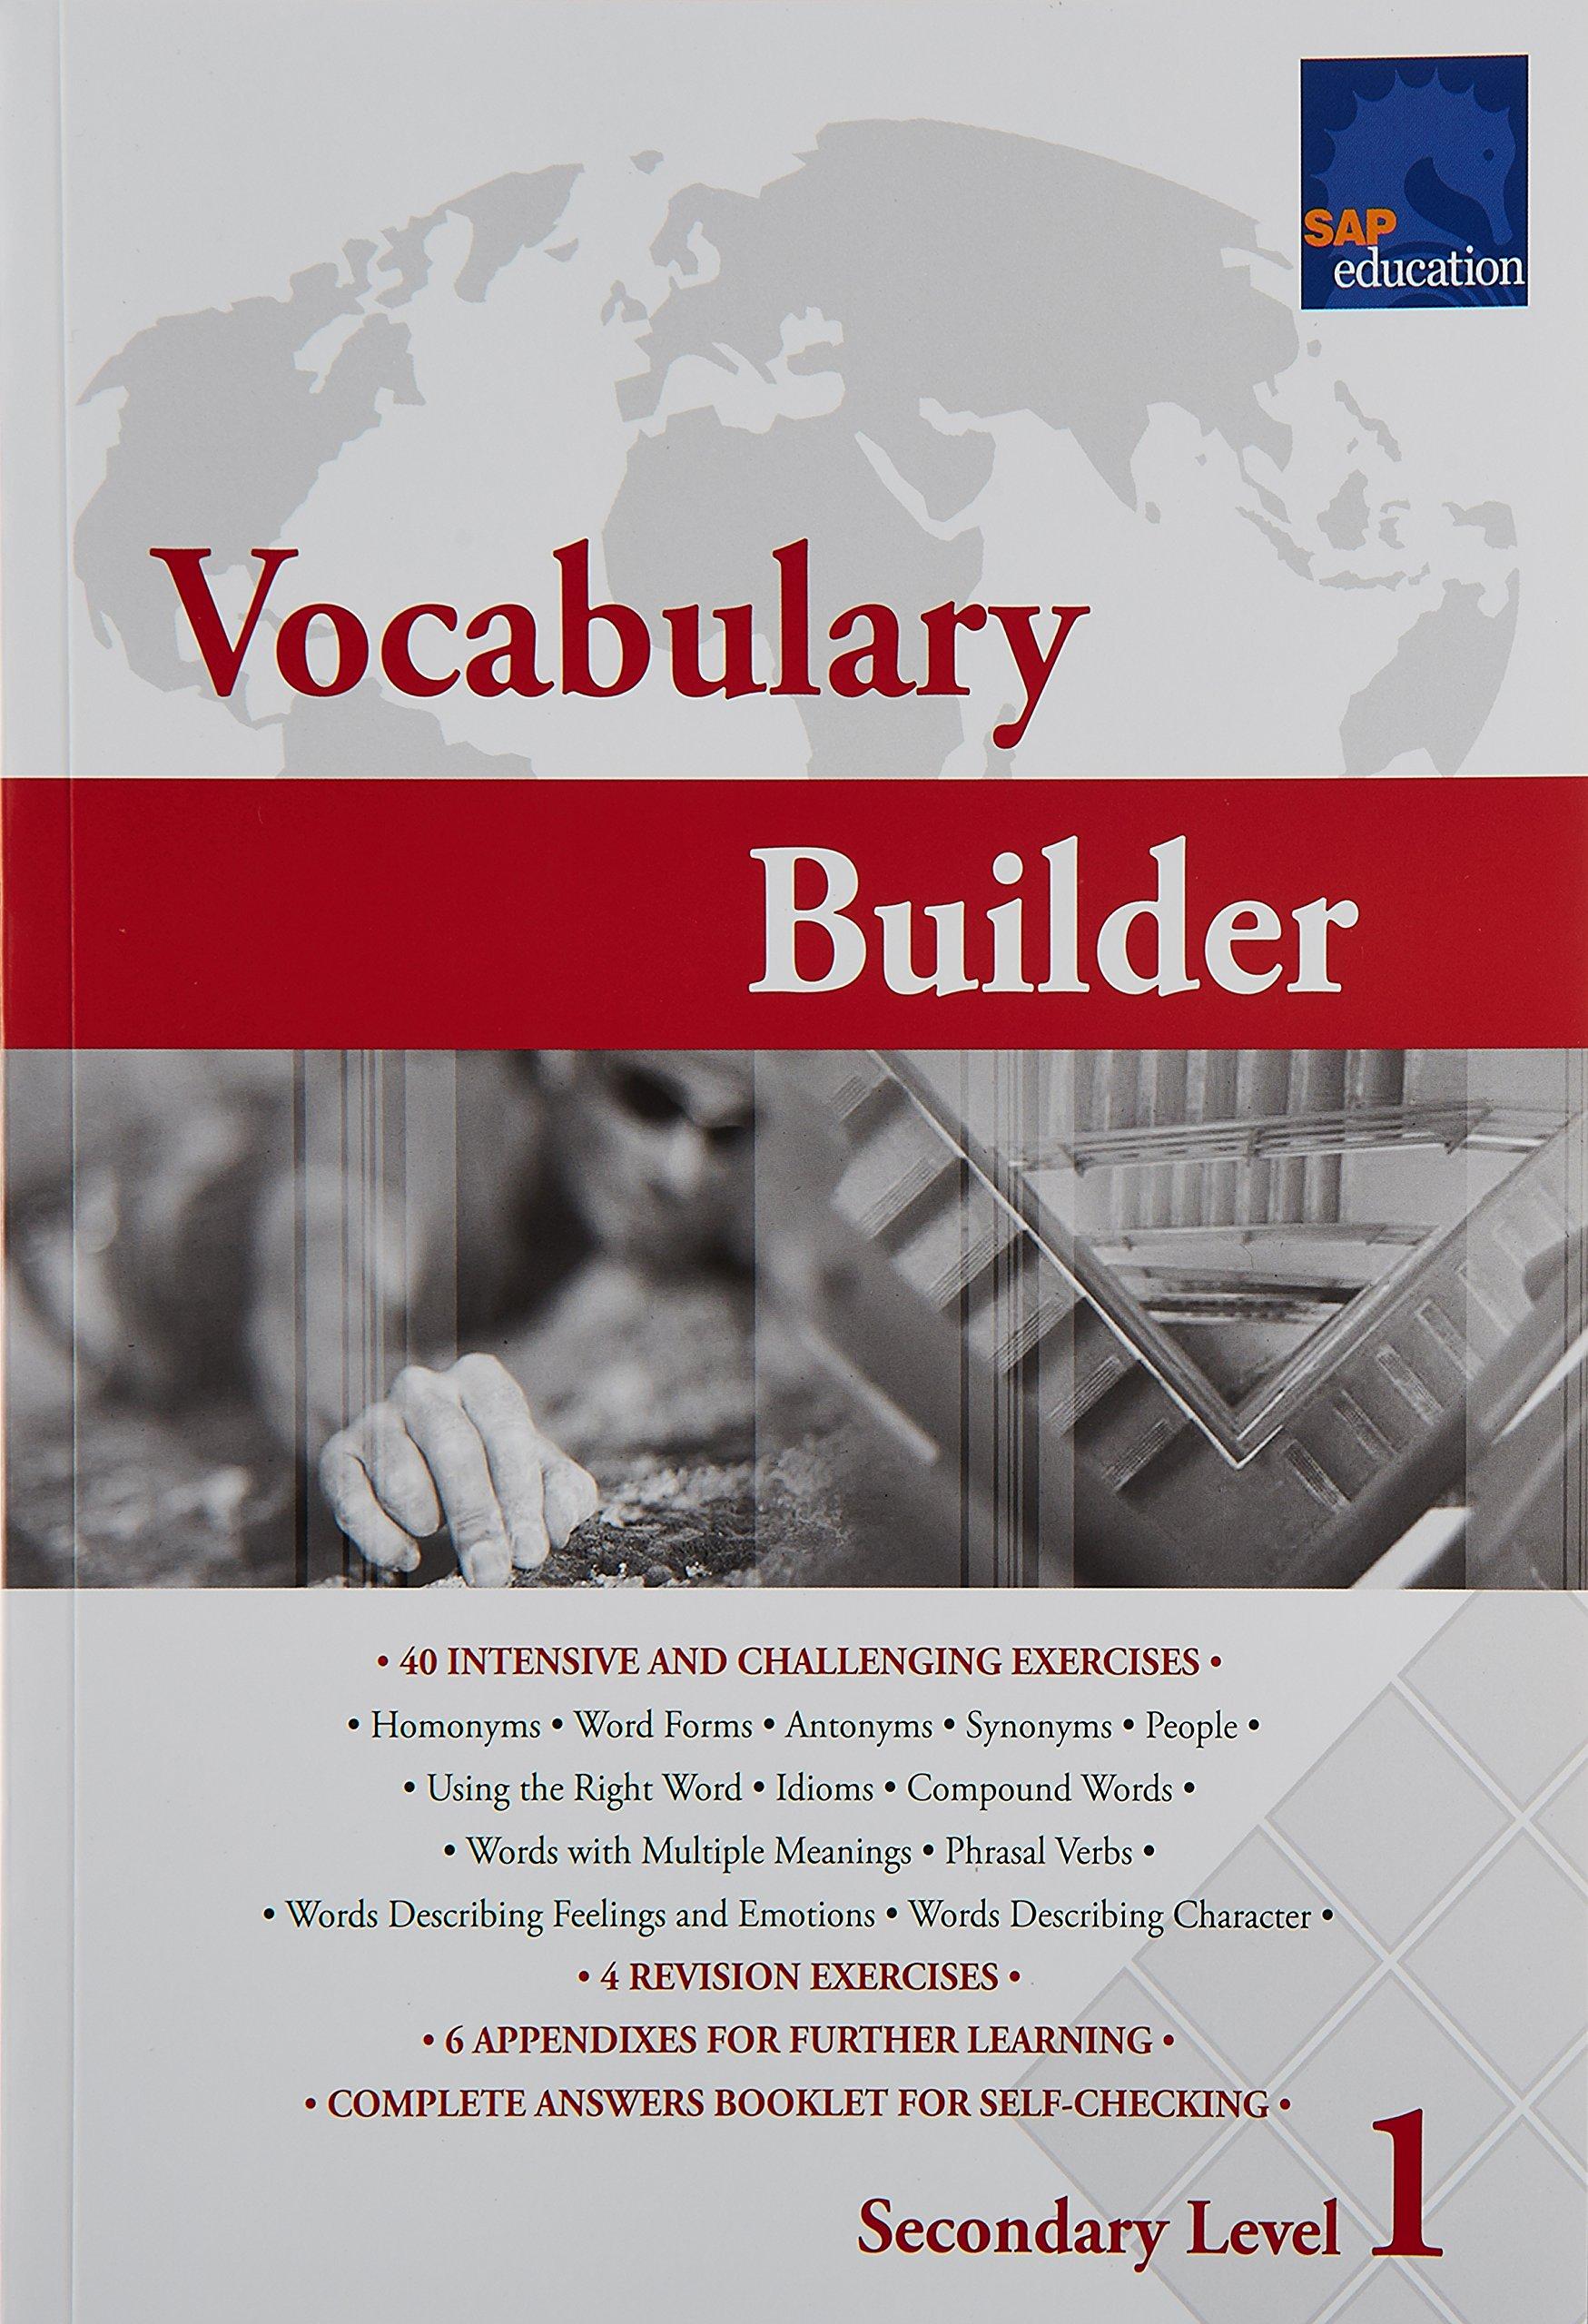 SAP Vocabulary Builder Secondary Level 1 [Paperback] [Jan 01, 2012] Peter Yam